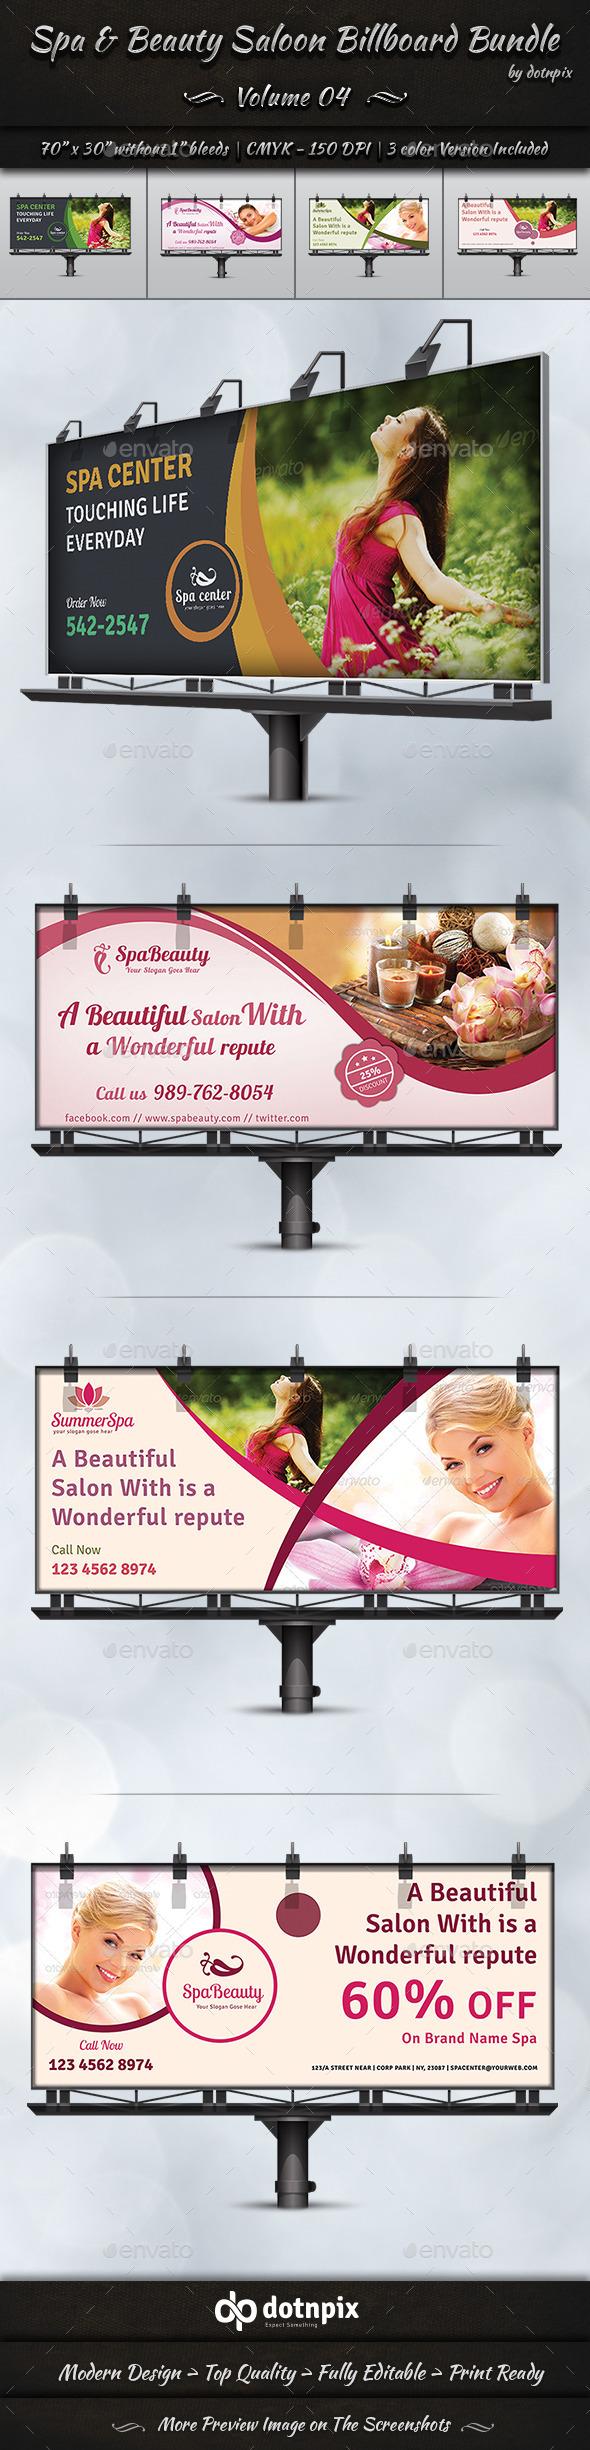 Spa & Beauty Saloon Billboard Bundle | Volume 4 - Signage Print Templates